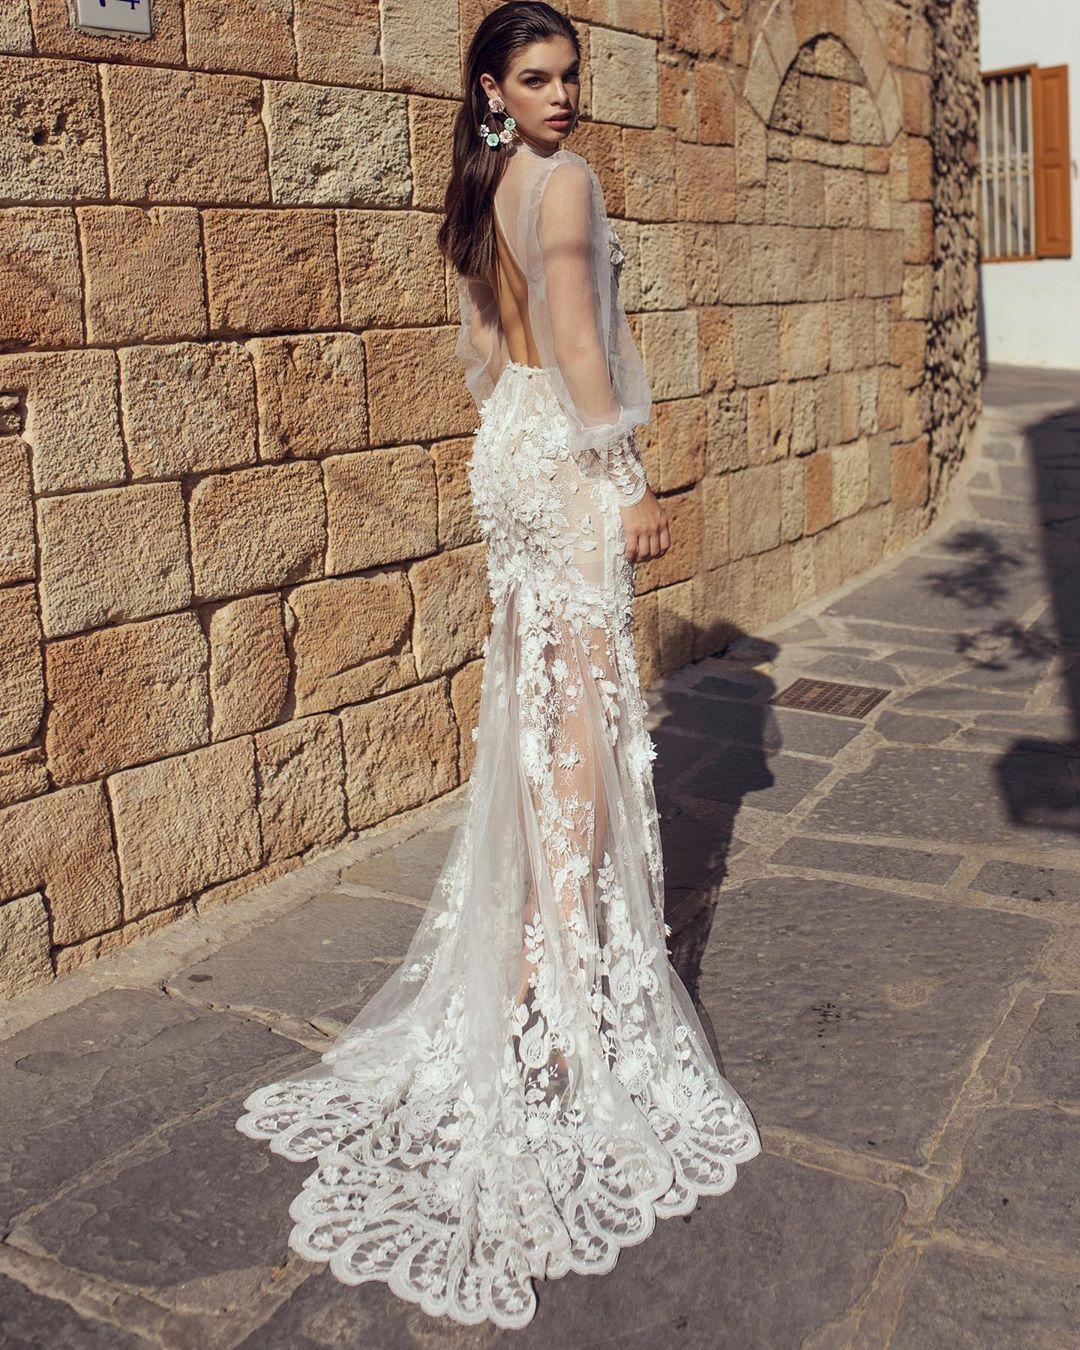 Lace Transparent Wedding Dress